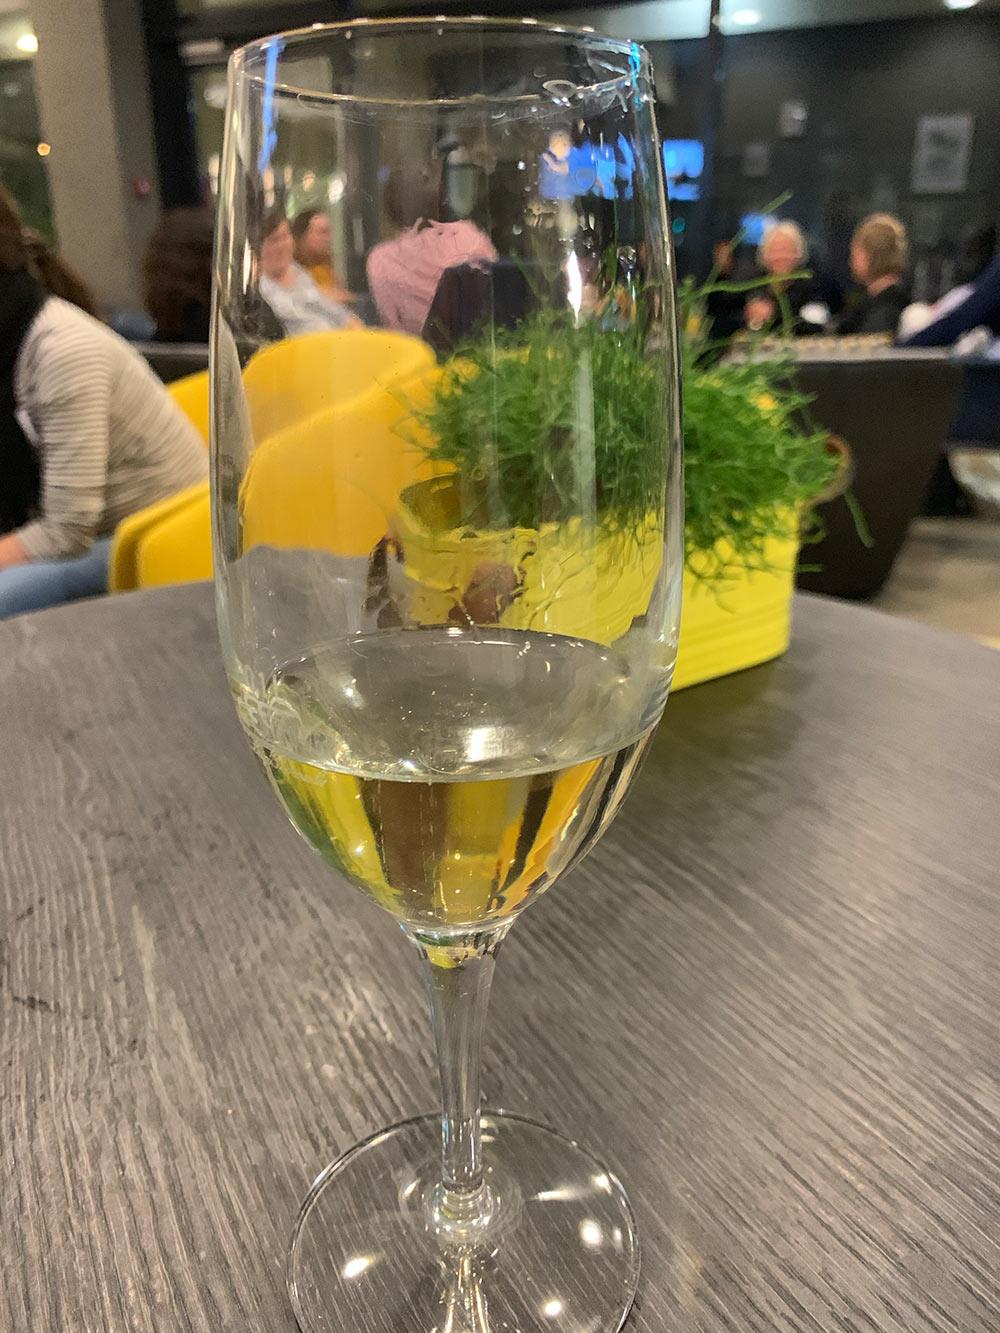 swissblogfamily 2019 59 - 4. Swiss Blog Family 2019 Event - Blogger Kongress in Zürich – Mein Rückblick